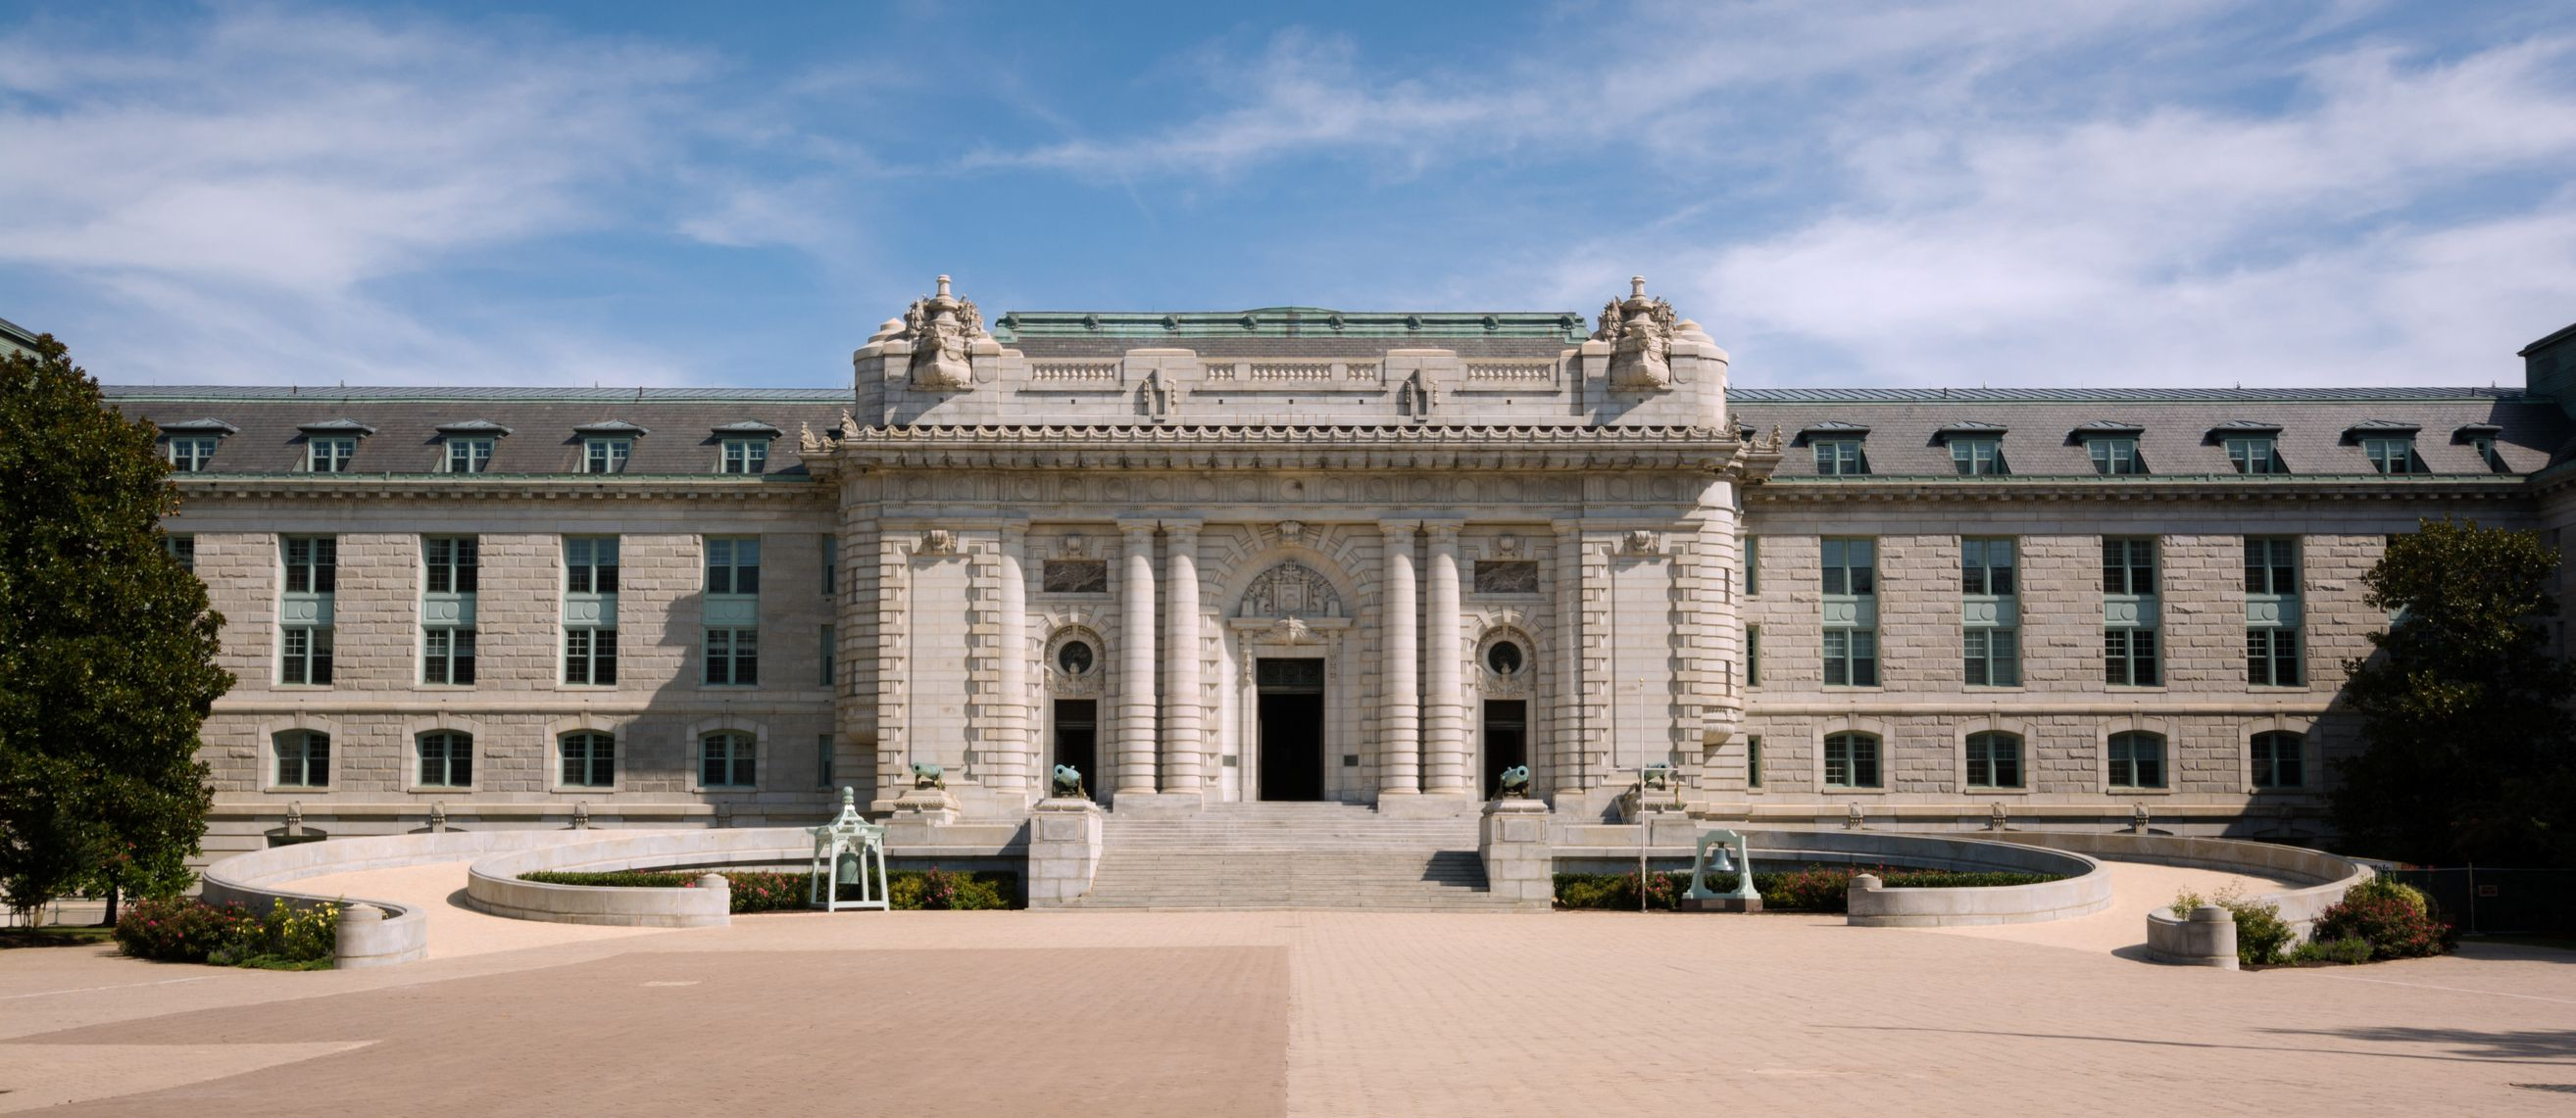 U.S. Naval Academy Campus Photos